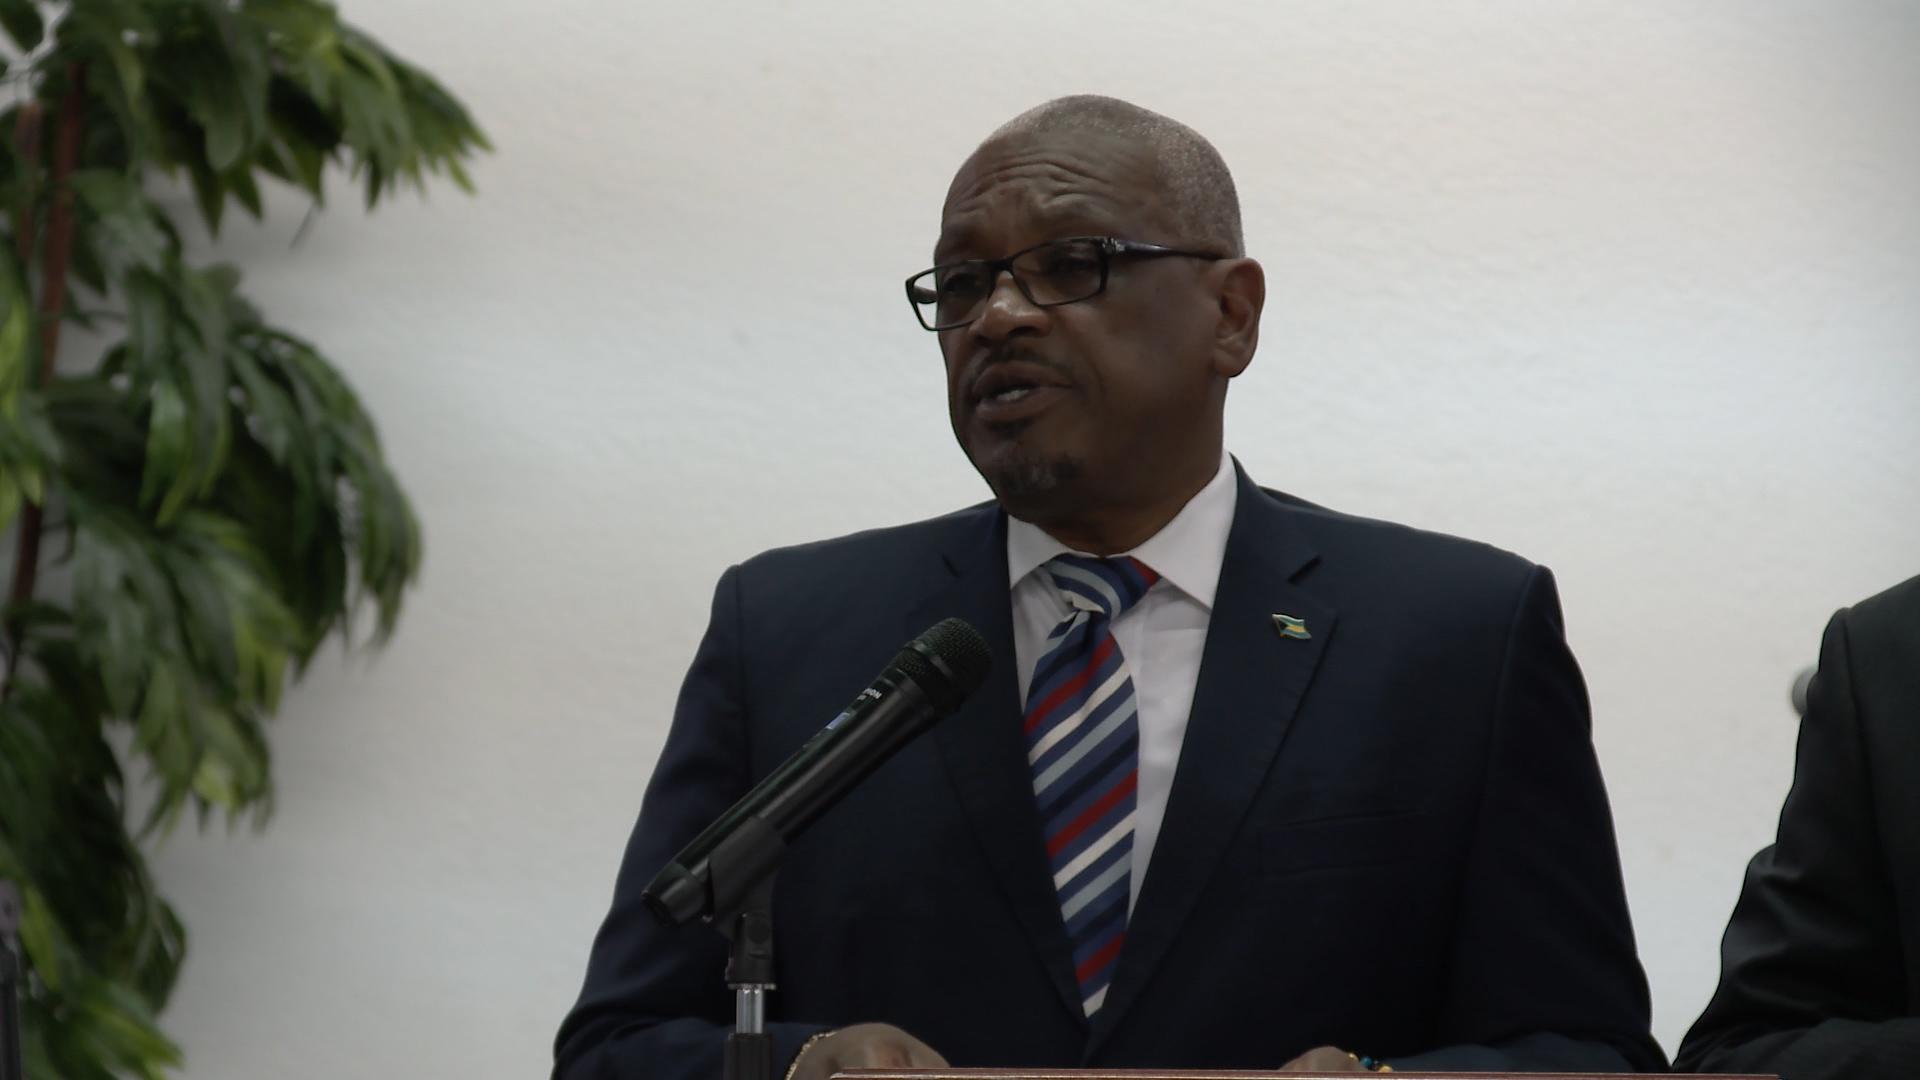 PM addresses Haitian community ahead of demolition deadline